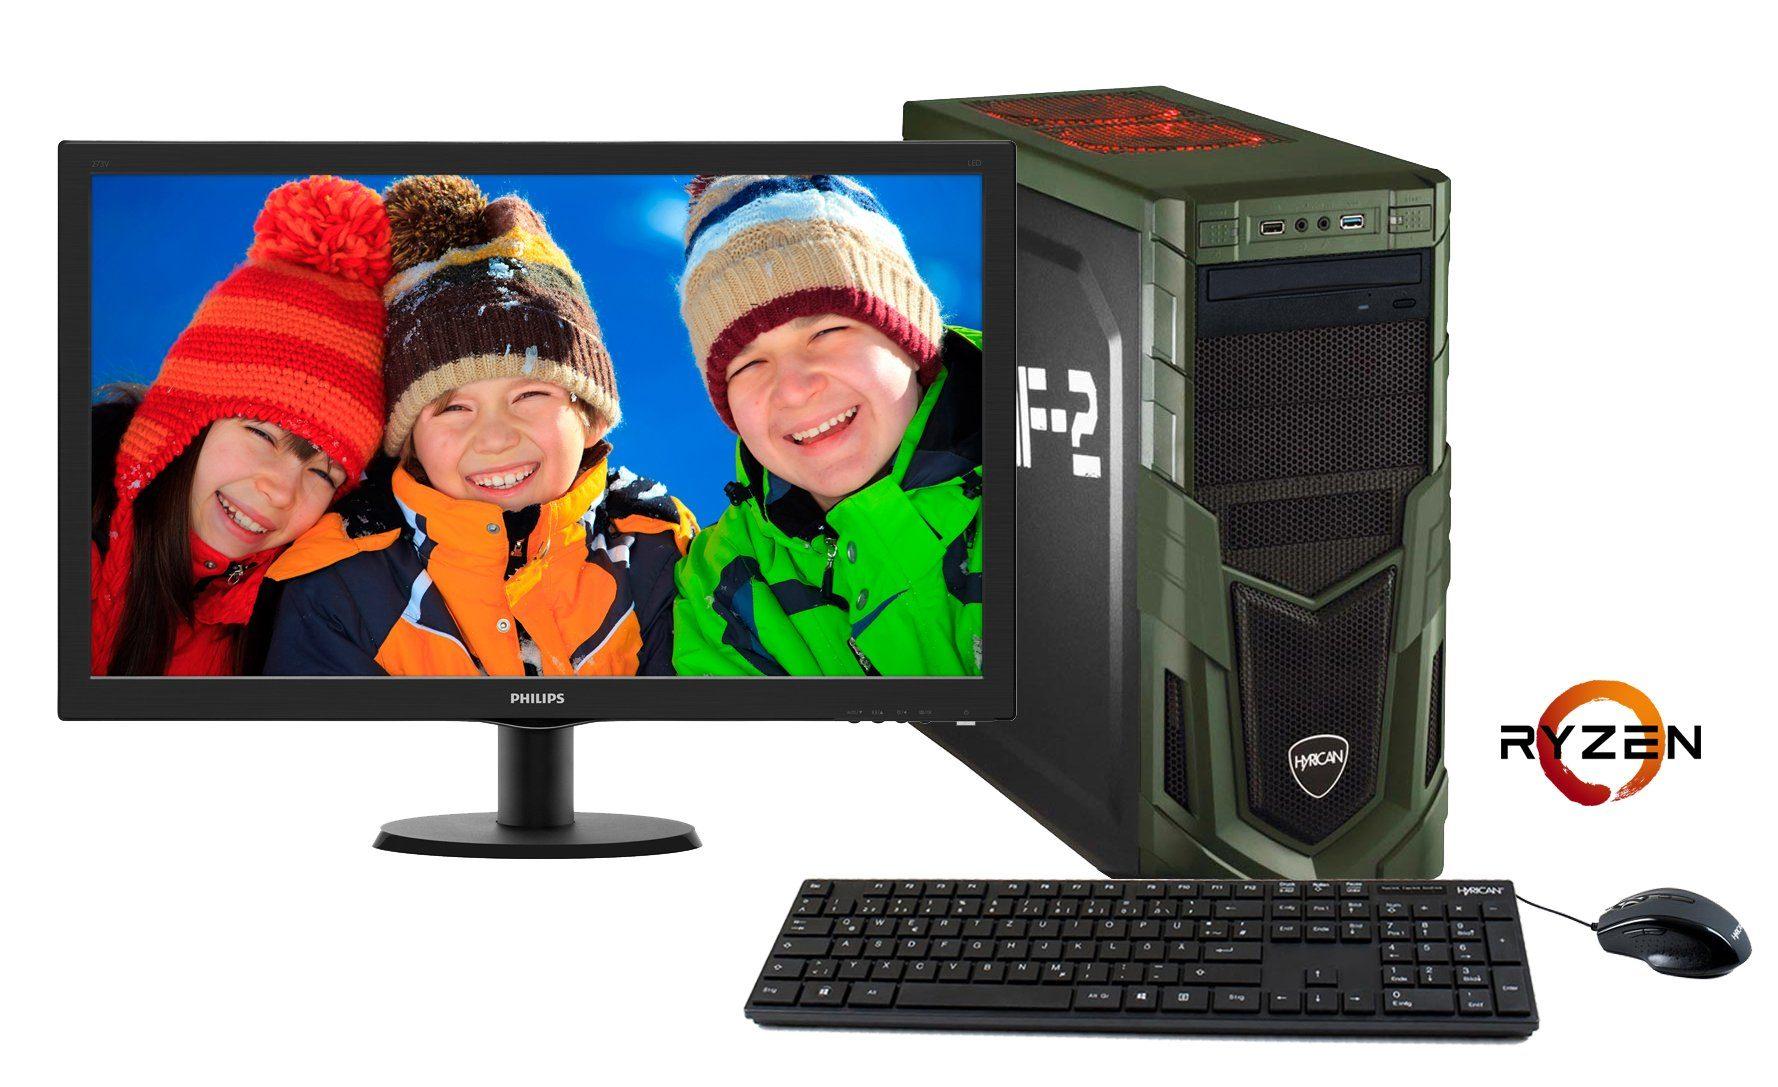 HYRICAN Gaming PC AMD Ryzen™ 7 1700 16GB GeForce® GTX 1060 + Monitor »MilitaryGaming SET1241«